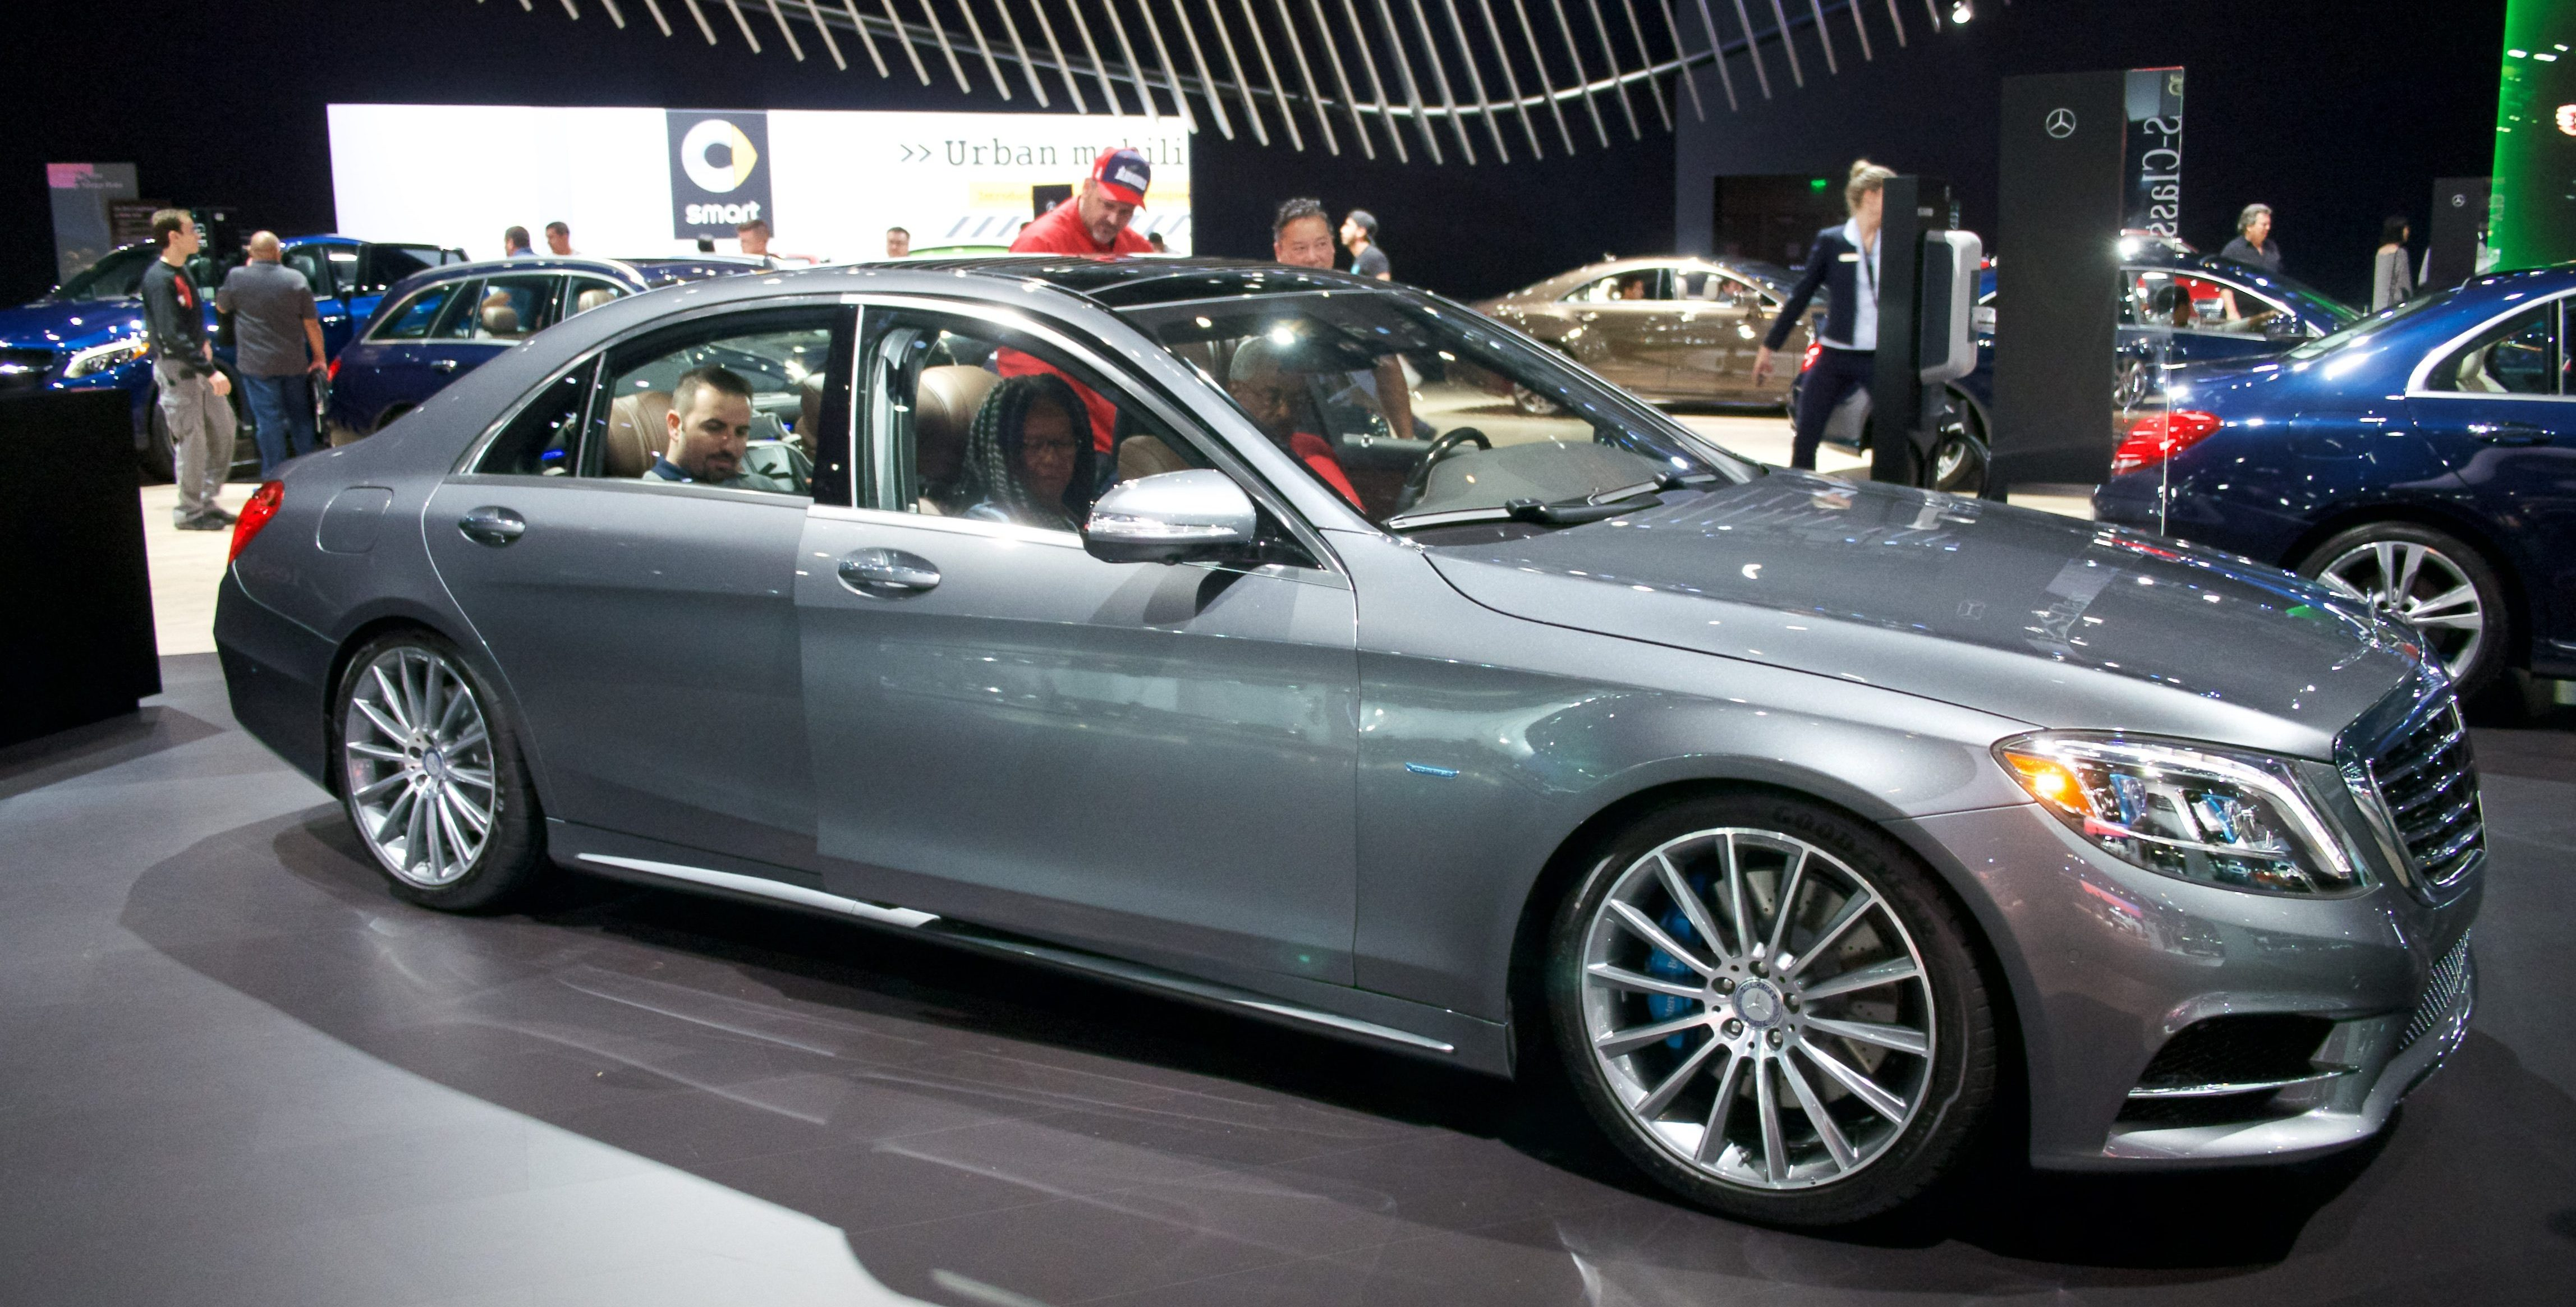 Mercedes Benz Has An All Electric Eqs Sedan To Follow The Eqc Suv In 2020 Electrek